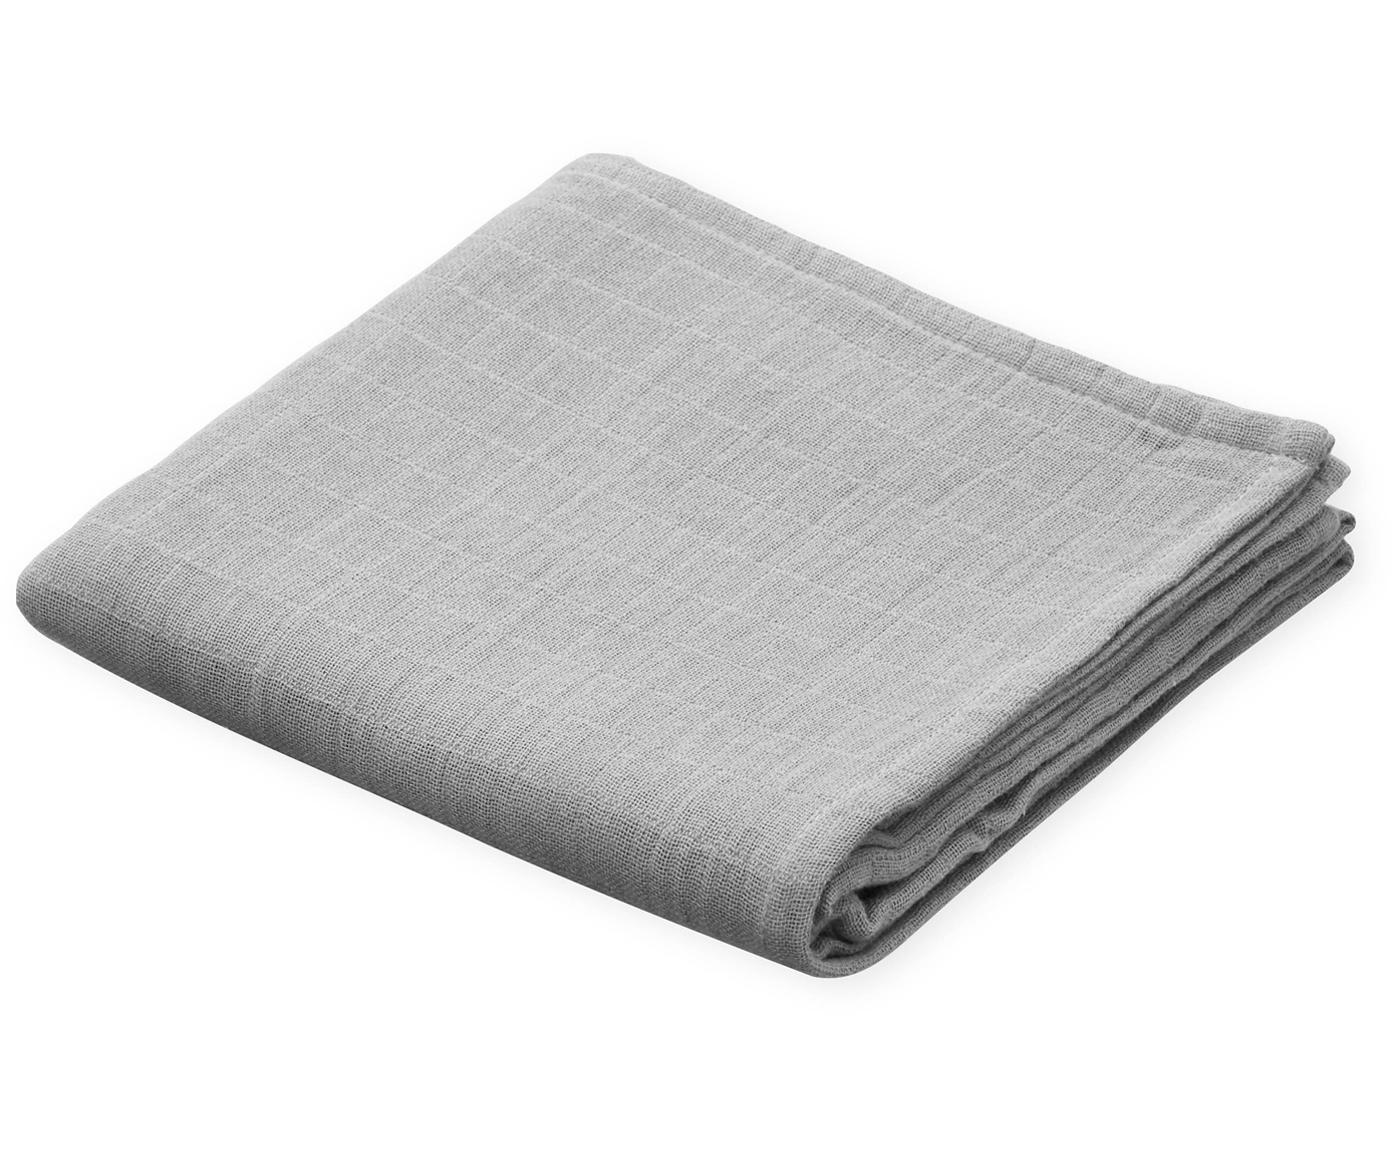 Mulltücher Muslin aus Bio-Baumwolle, 2 Stück, Bio-Baumwolle, GOTS-zertifiziert, Grau, 70 x 70 cm